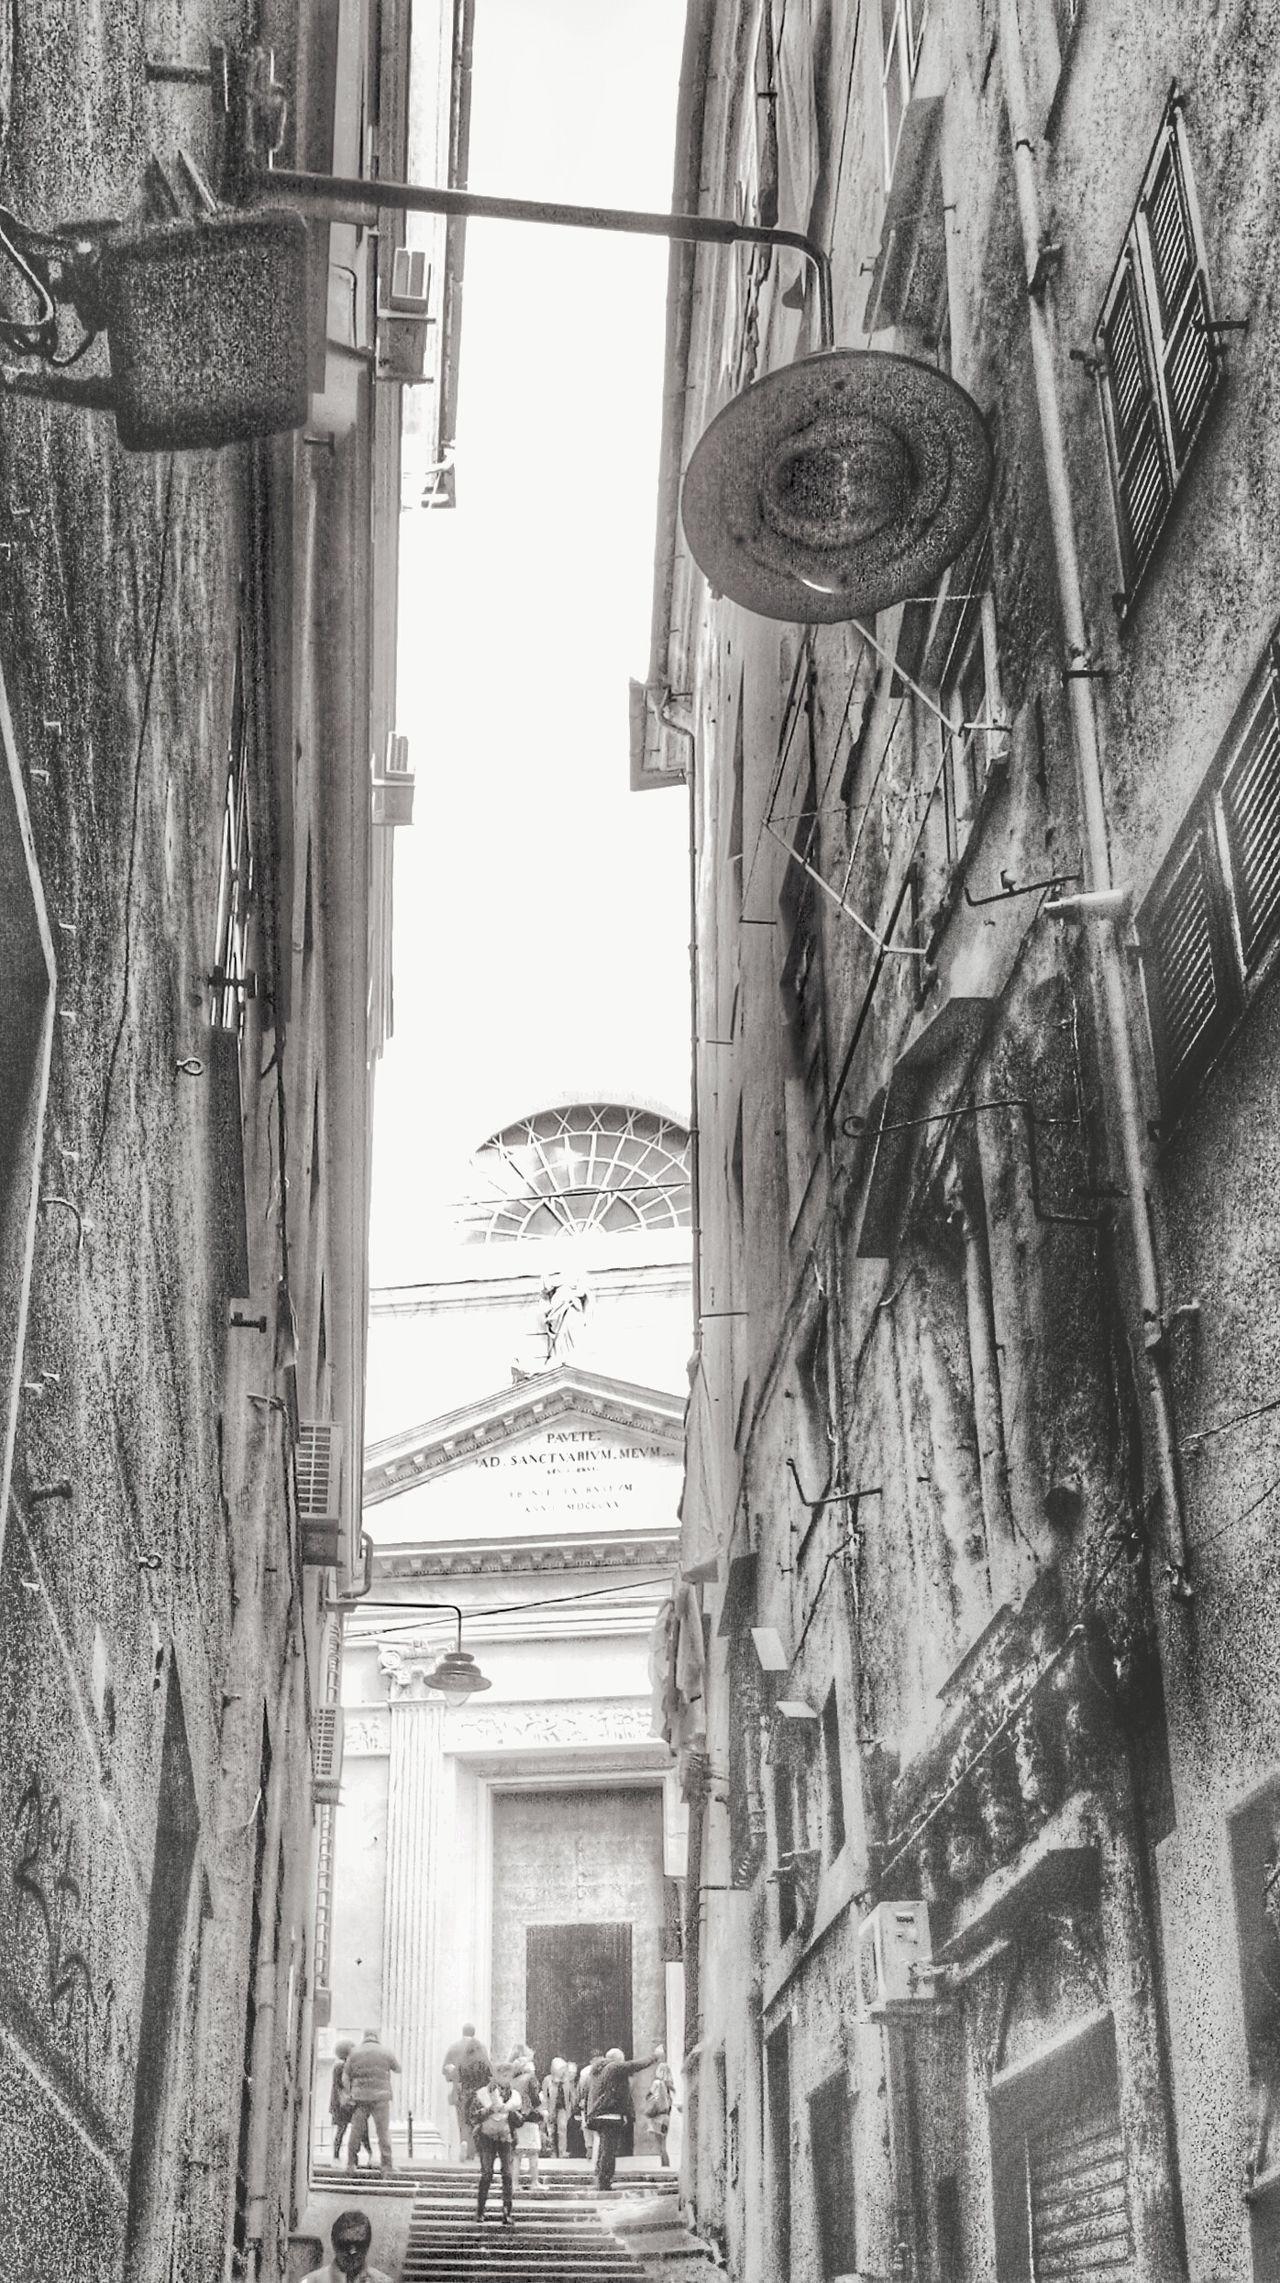 """Caroggio e gexa"". Caroggi Chiesa Alley Stairway Salita Narrow Street Vicoligenova Vicoli Centro Storico Di Genova Genova ♥ Genova Lampposts Churches Street Photography Mobile Photography S3mini Snapseed Bianco E Nero Black And White B&w"